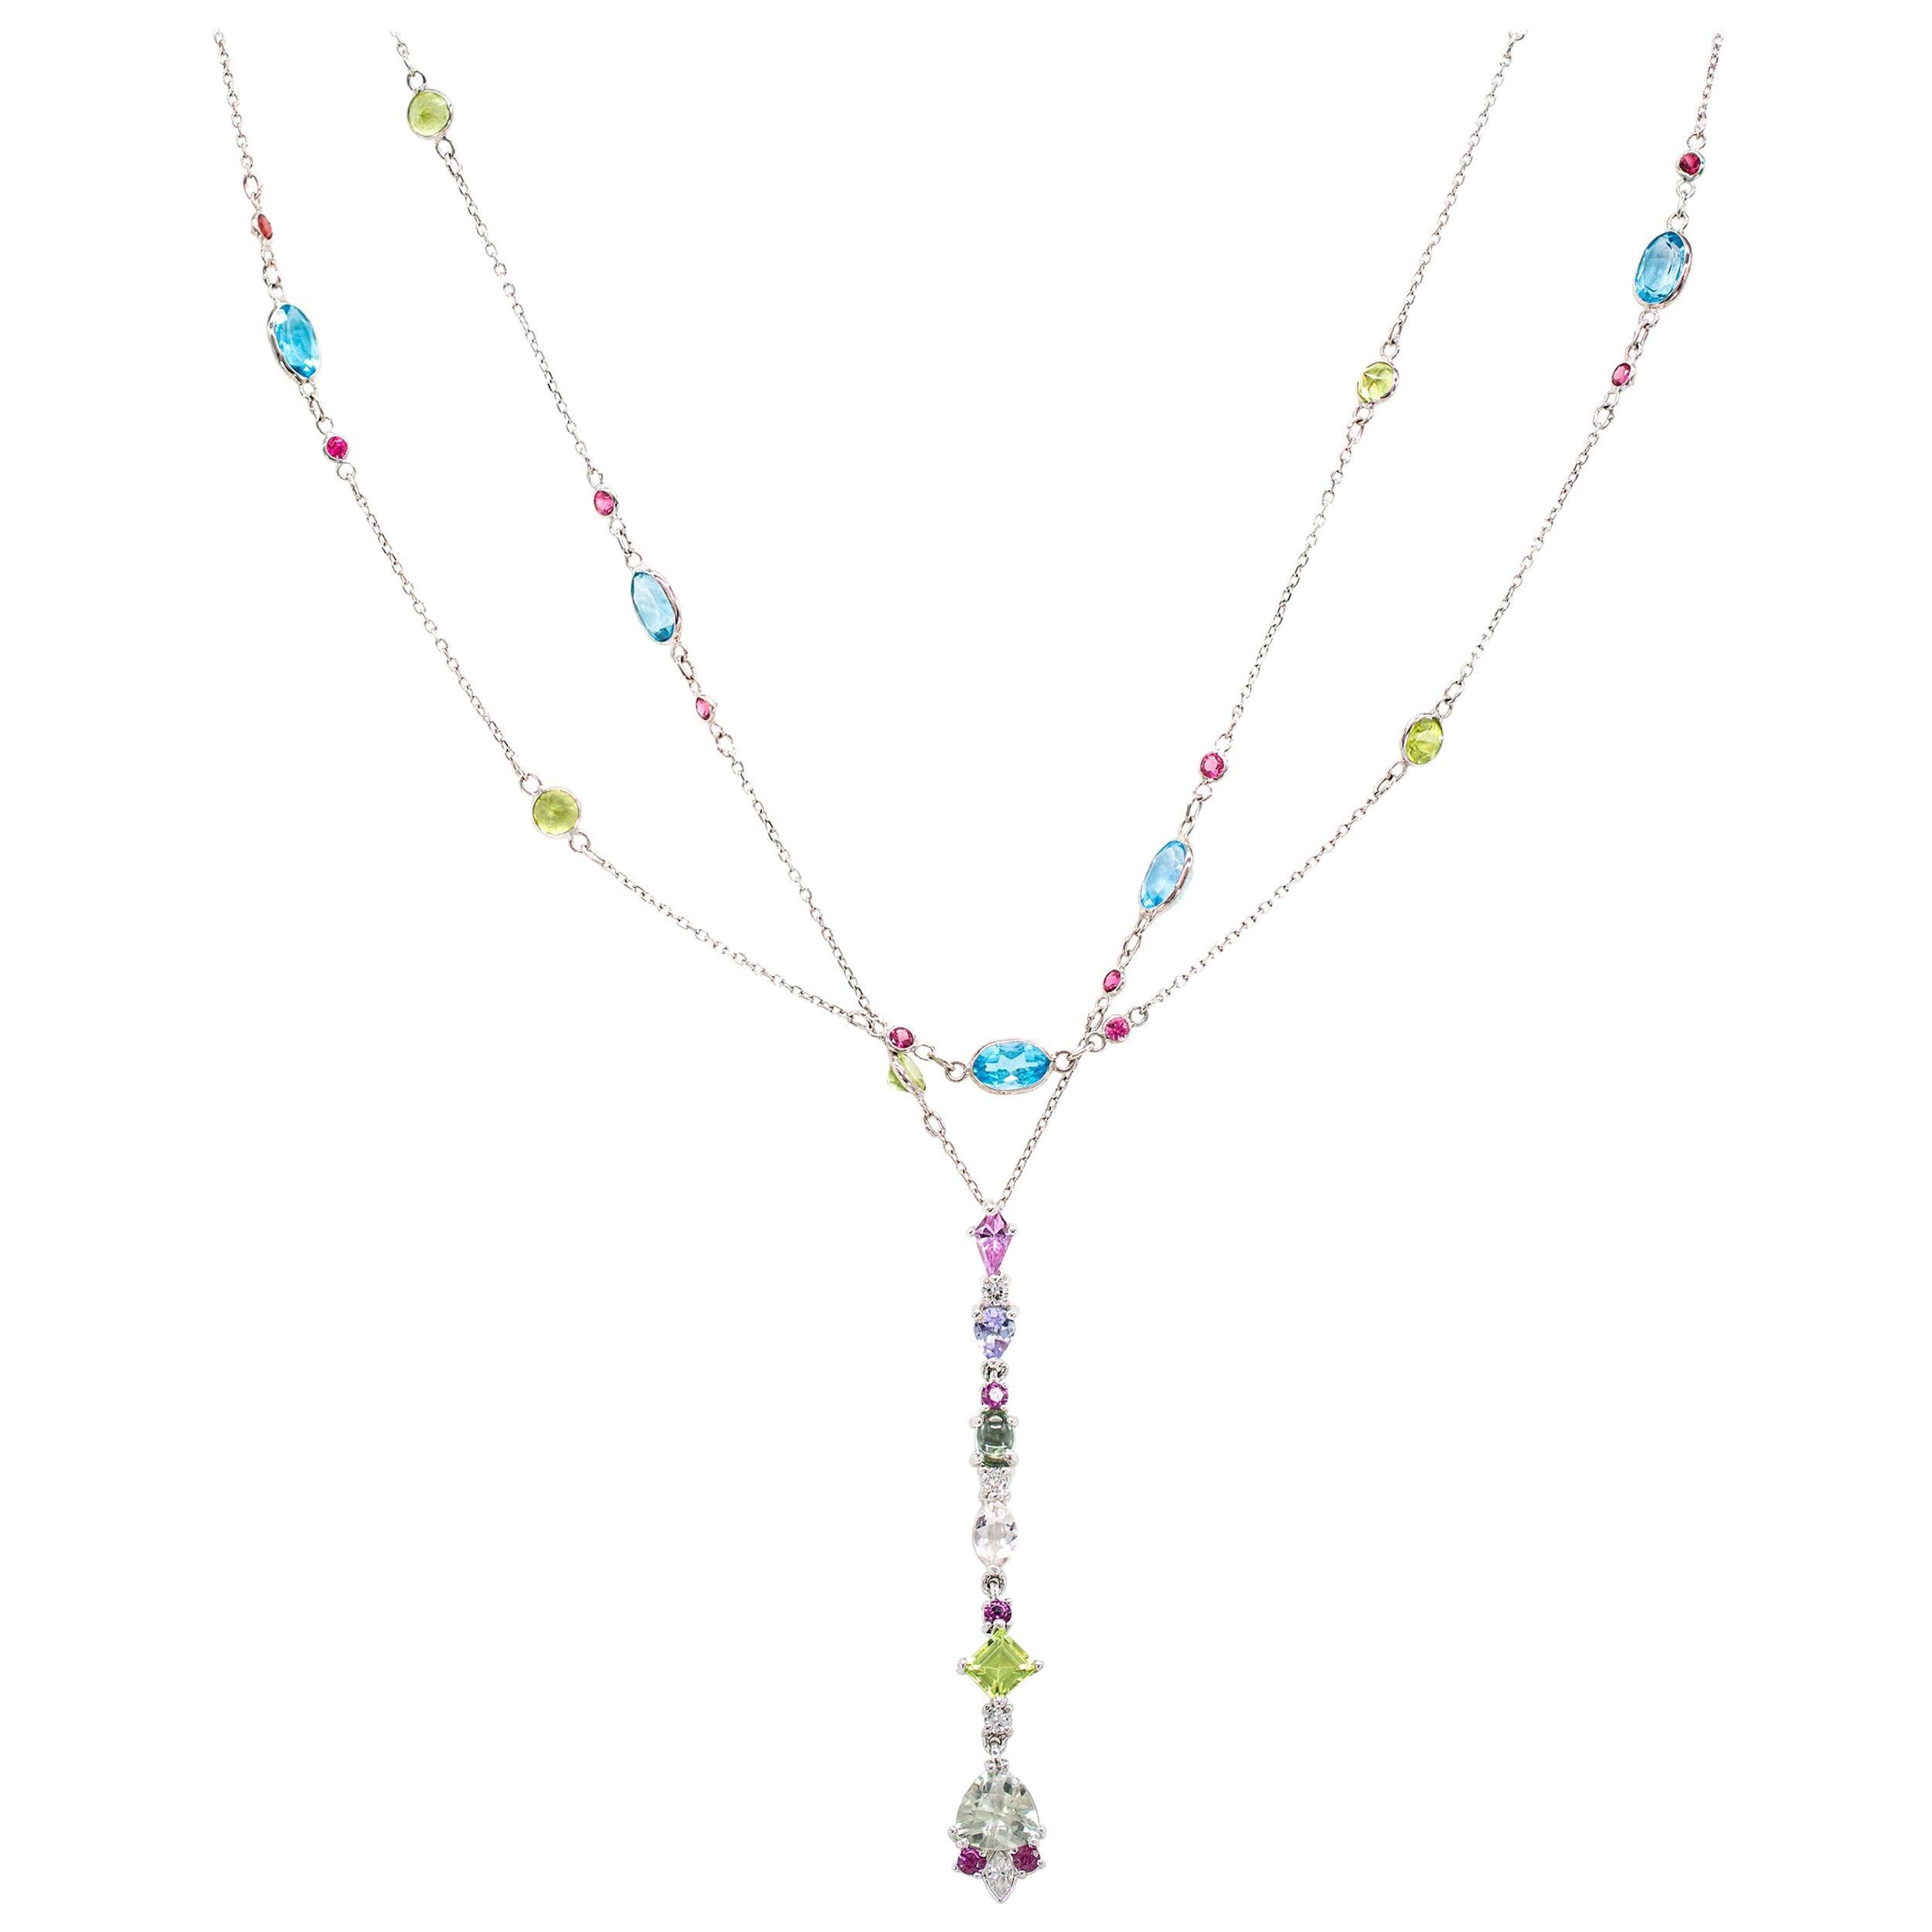 9.23 Carat Sapphire, Tanzanite, Tourmaline, Morganite, Peridot, Diamond Necklace